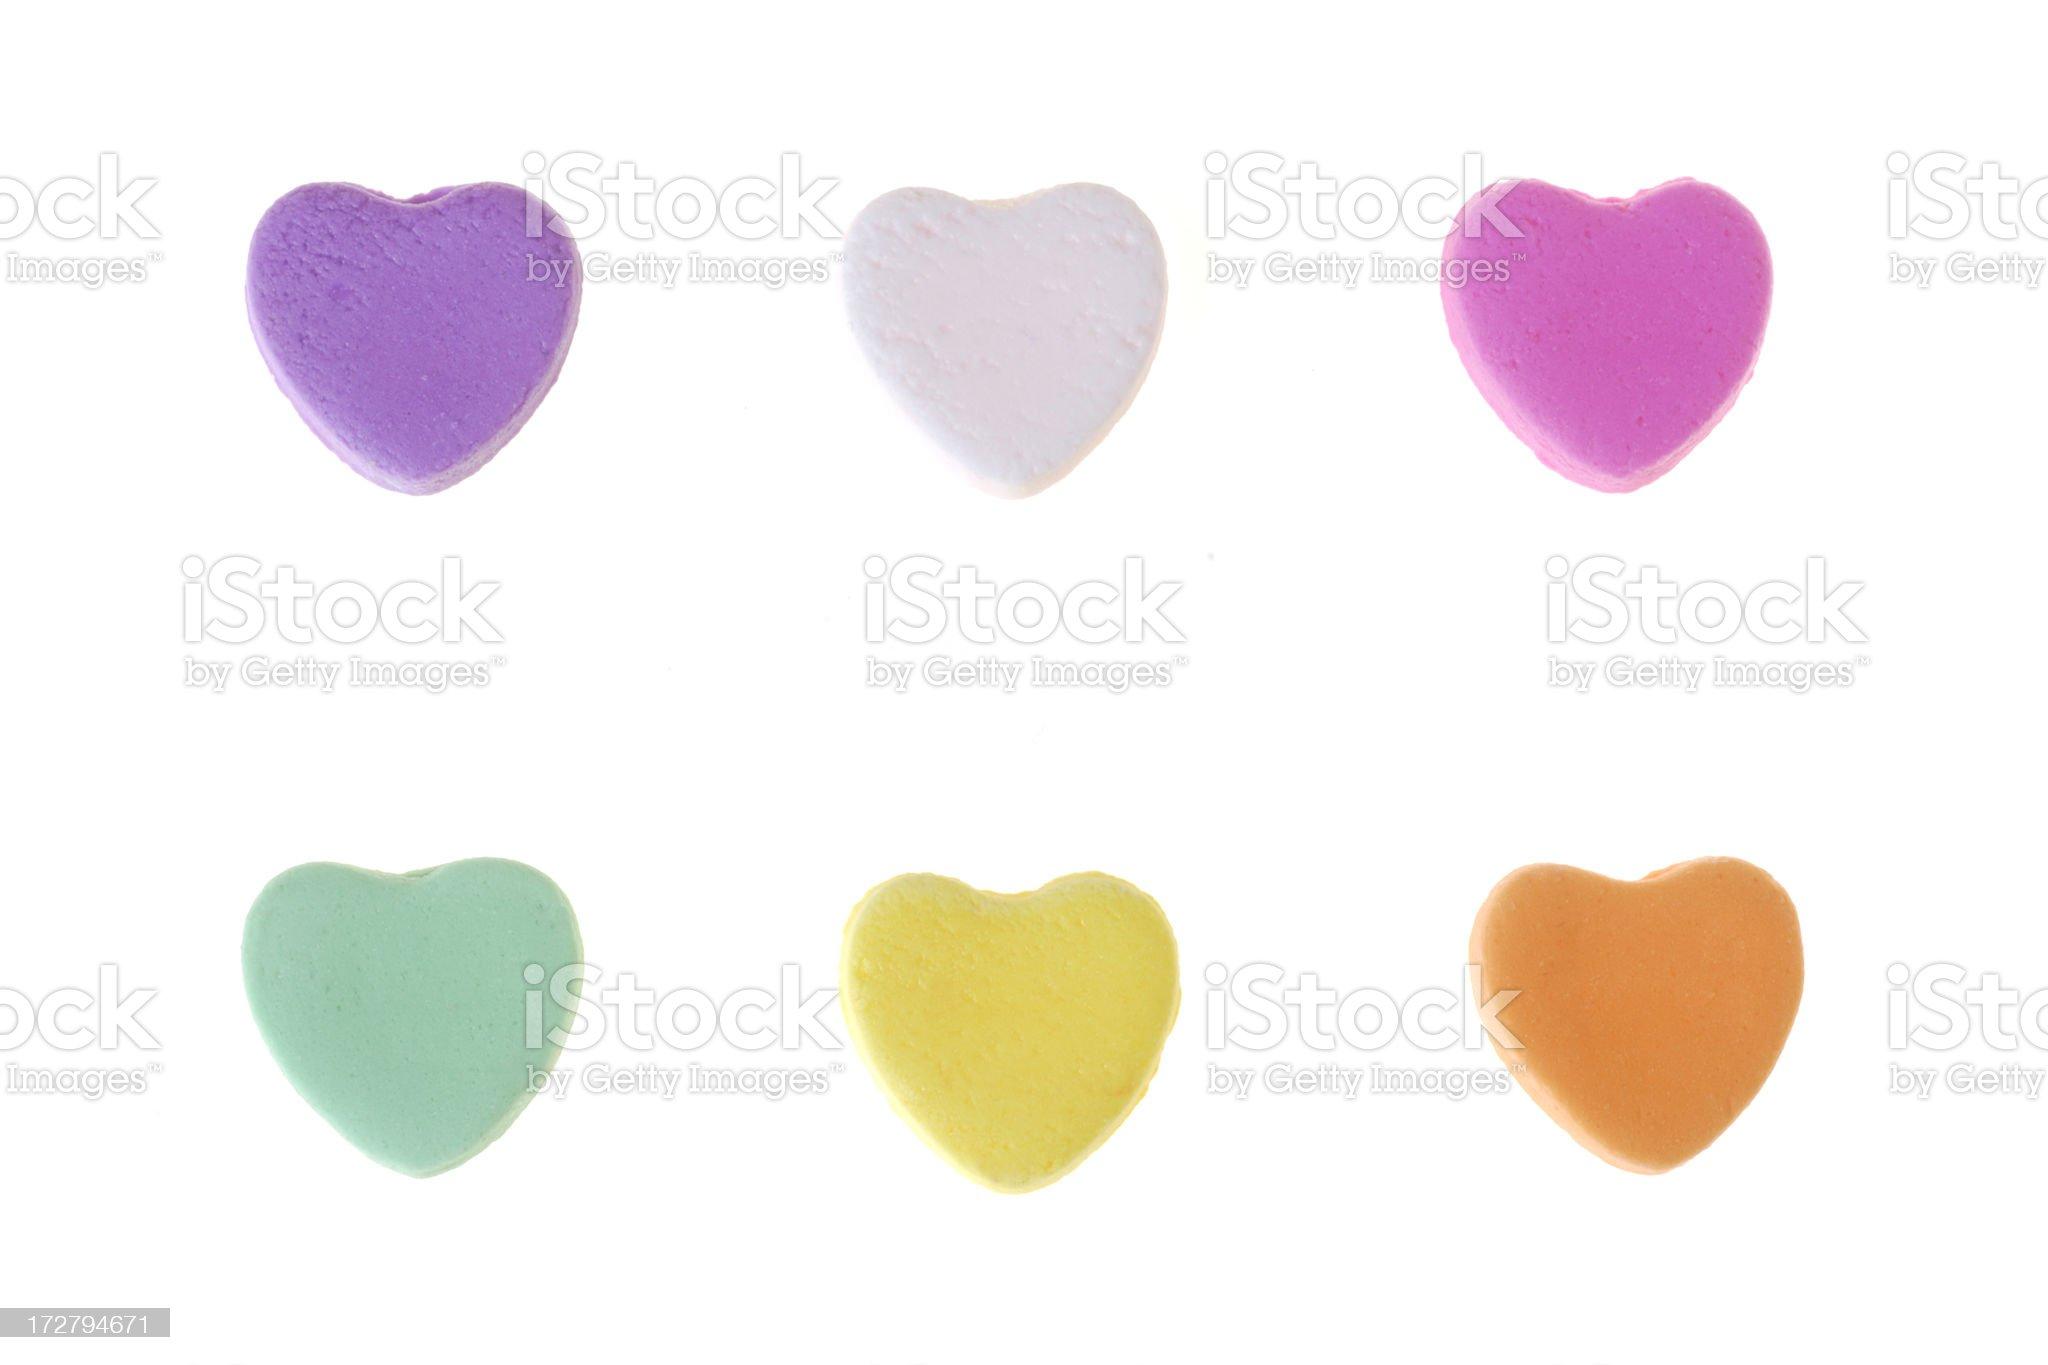 Lg Candy Hearts royalty-free stock photo